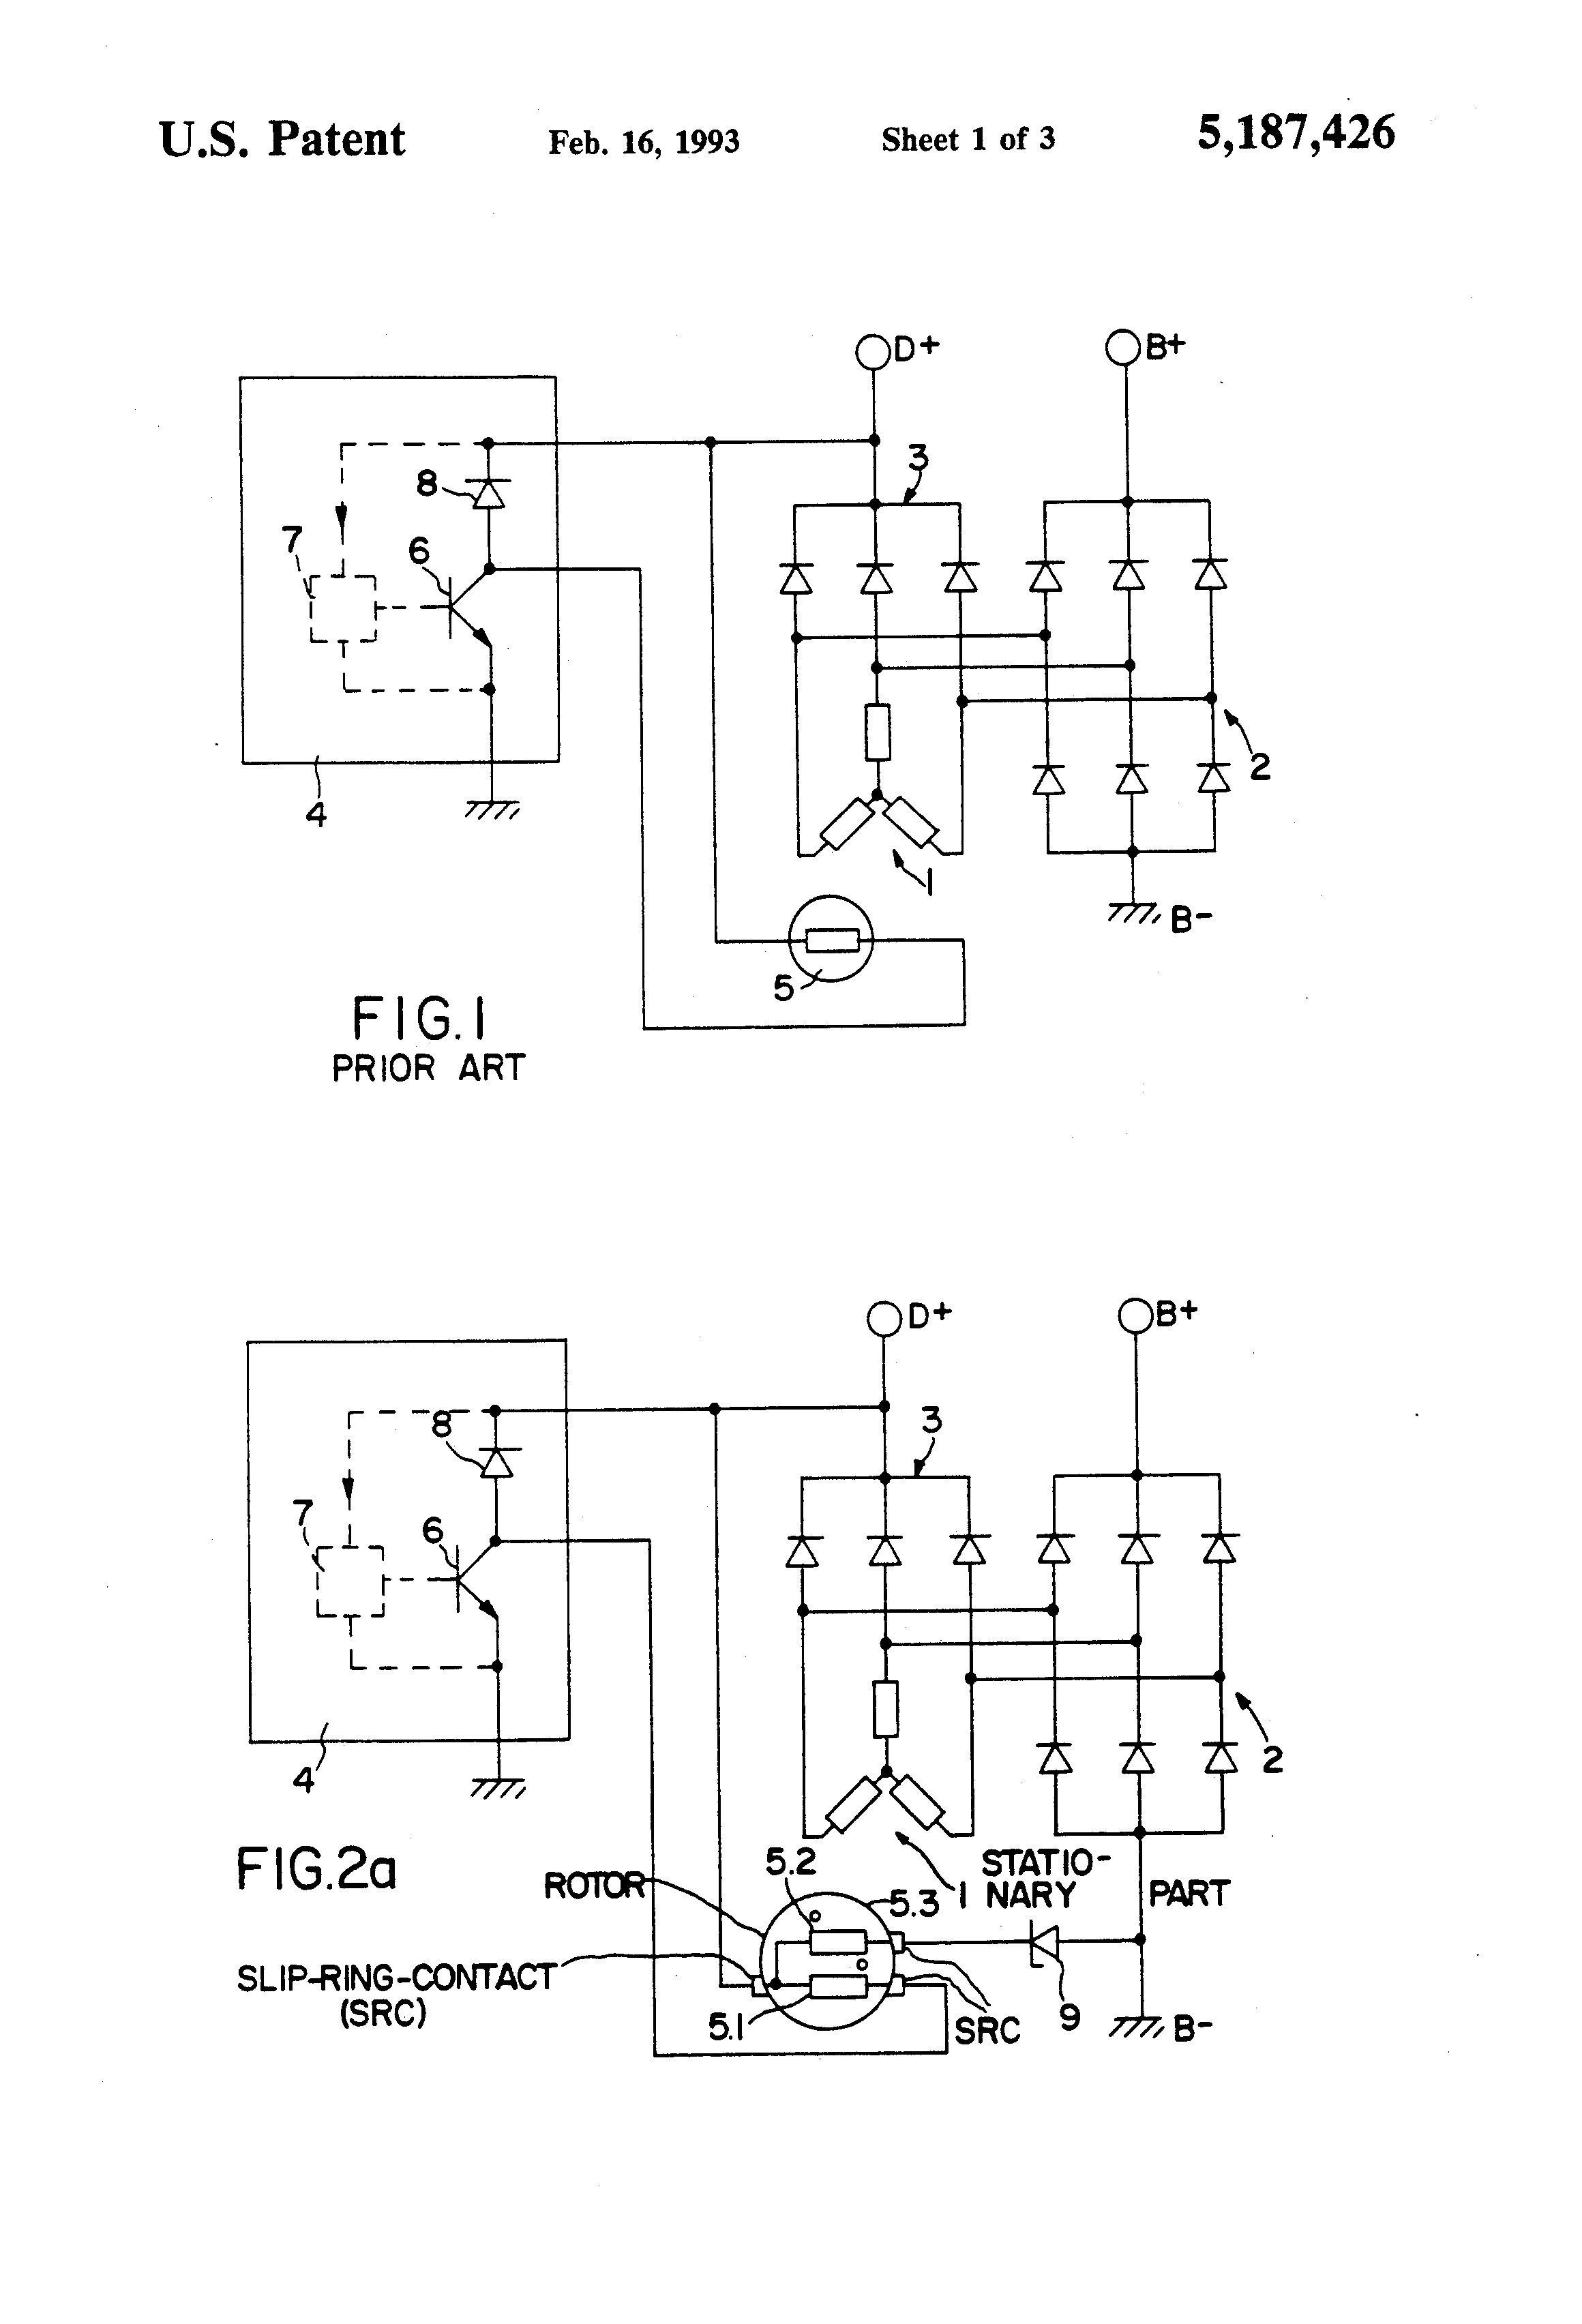 Car Engine Diagram Parts Hatz Engine Diagram Another Blog About Wiring Diagram • Of Car Engine Diagram Parts